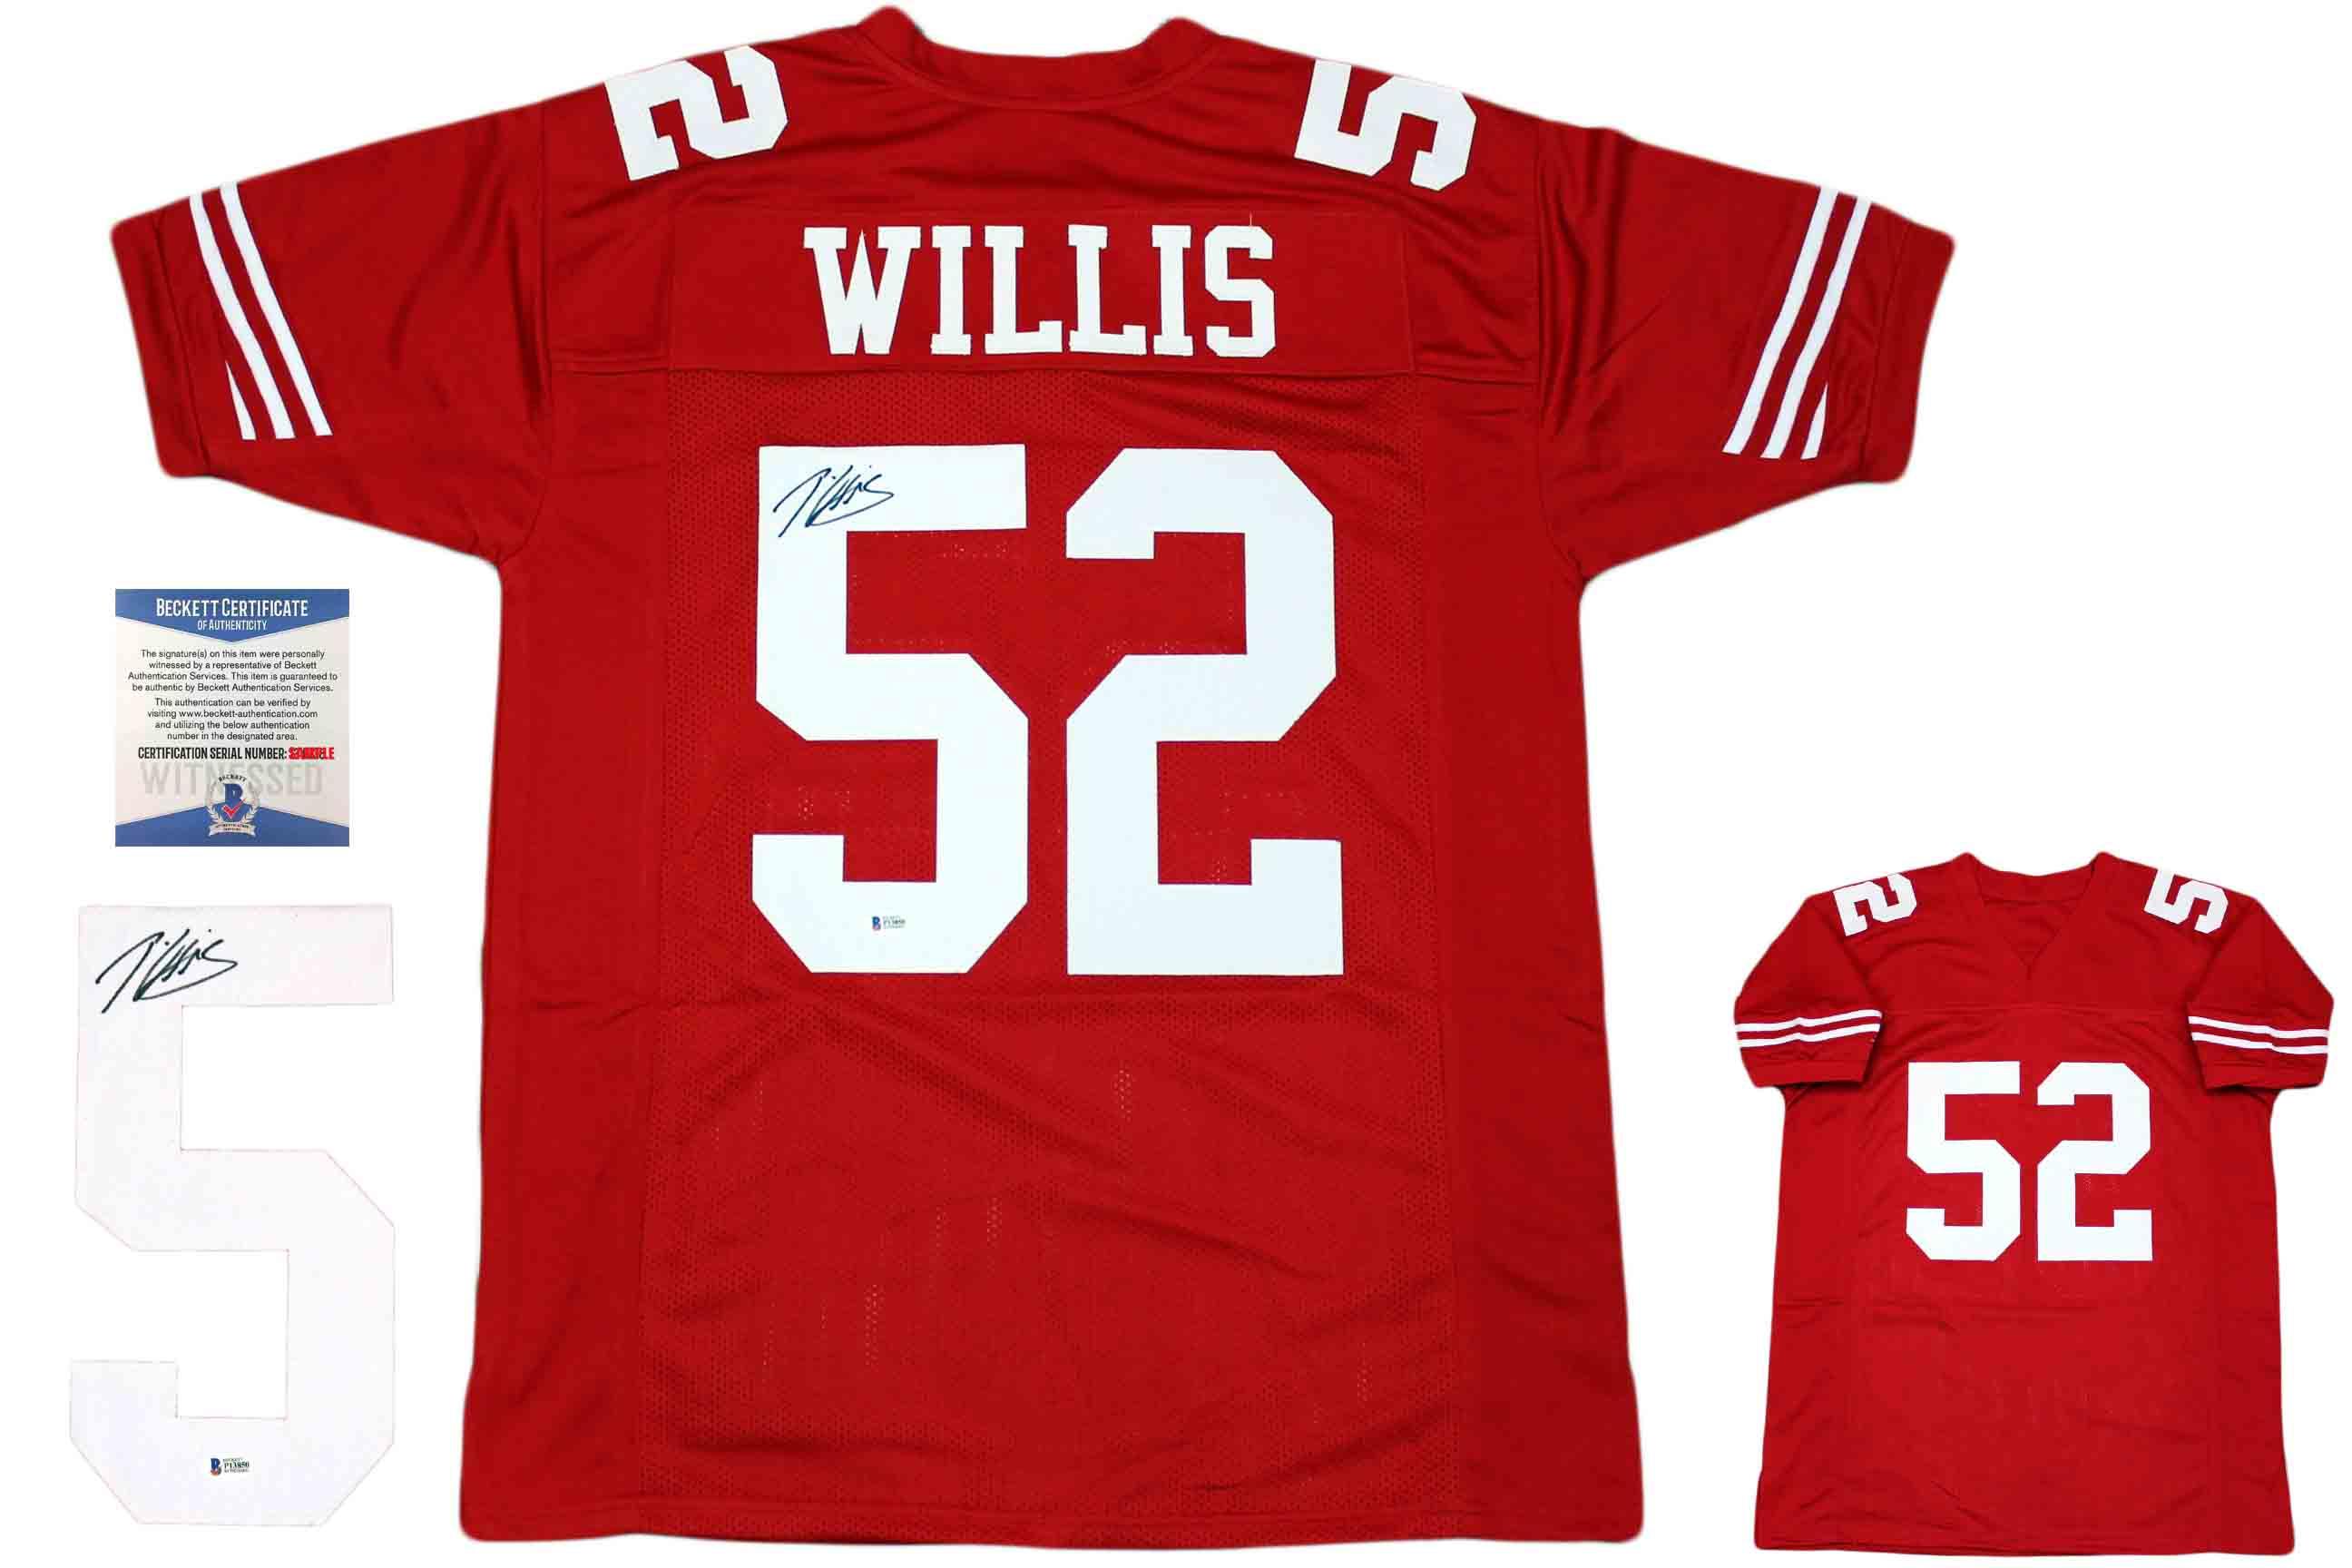 willis jersey